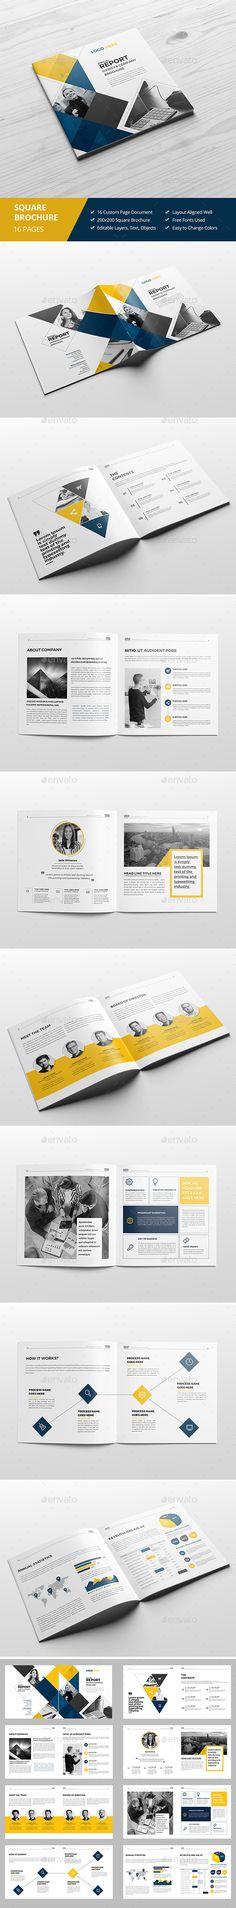 Haweya Square Brochure Template InDesign INDD